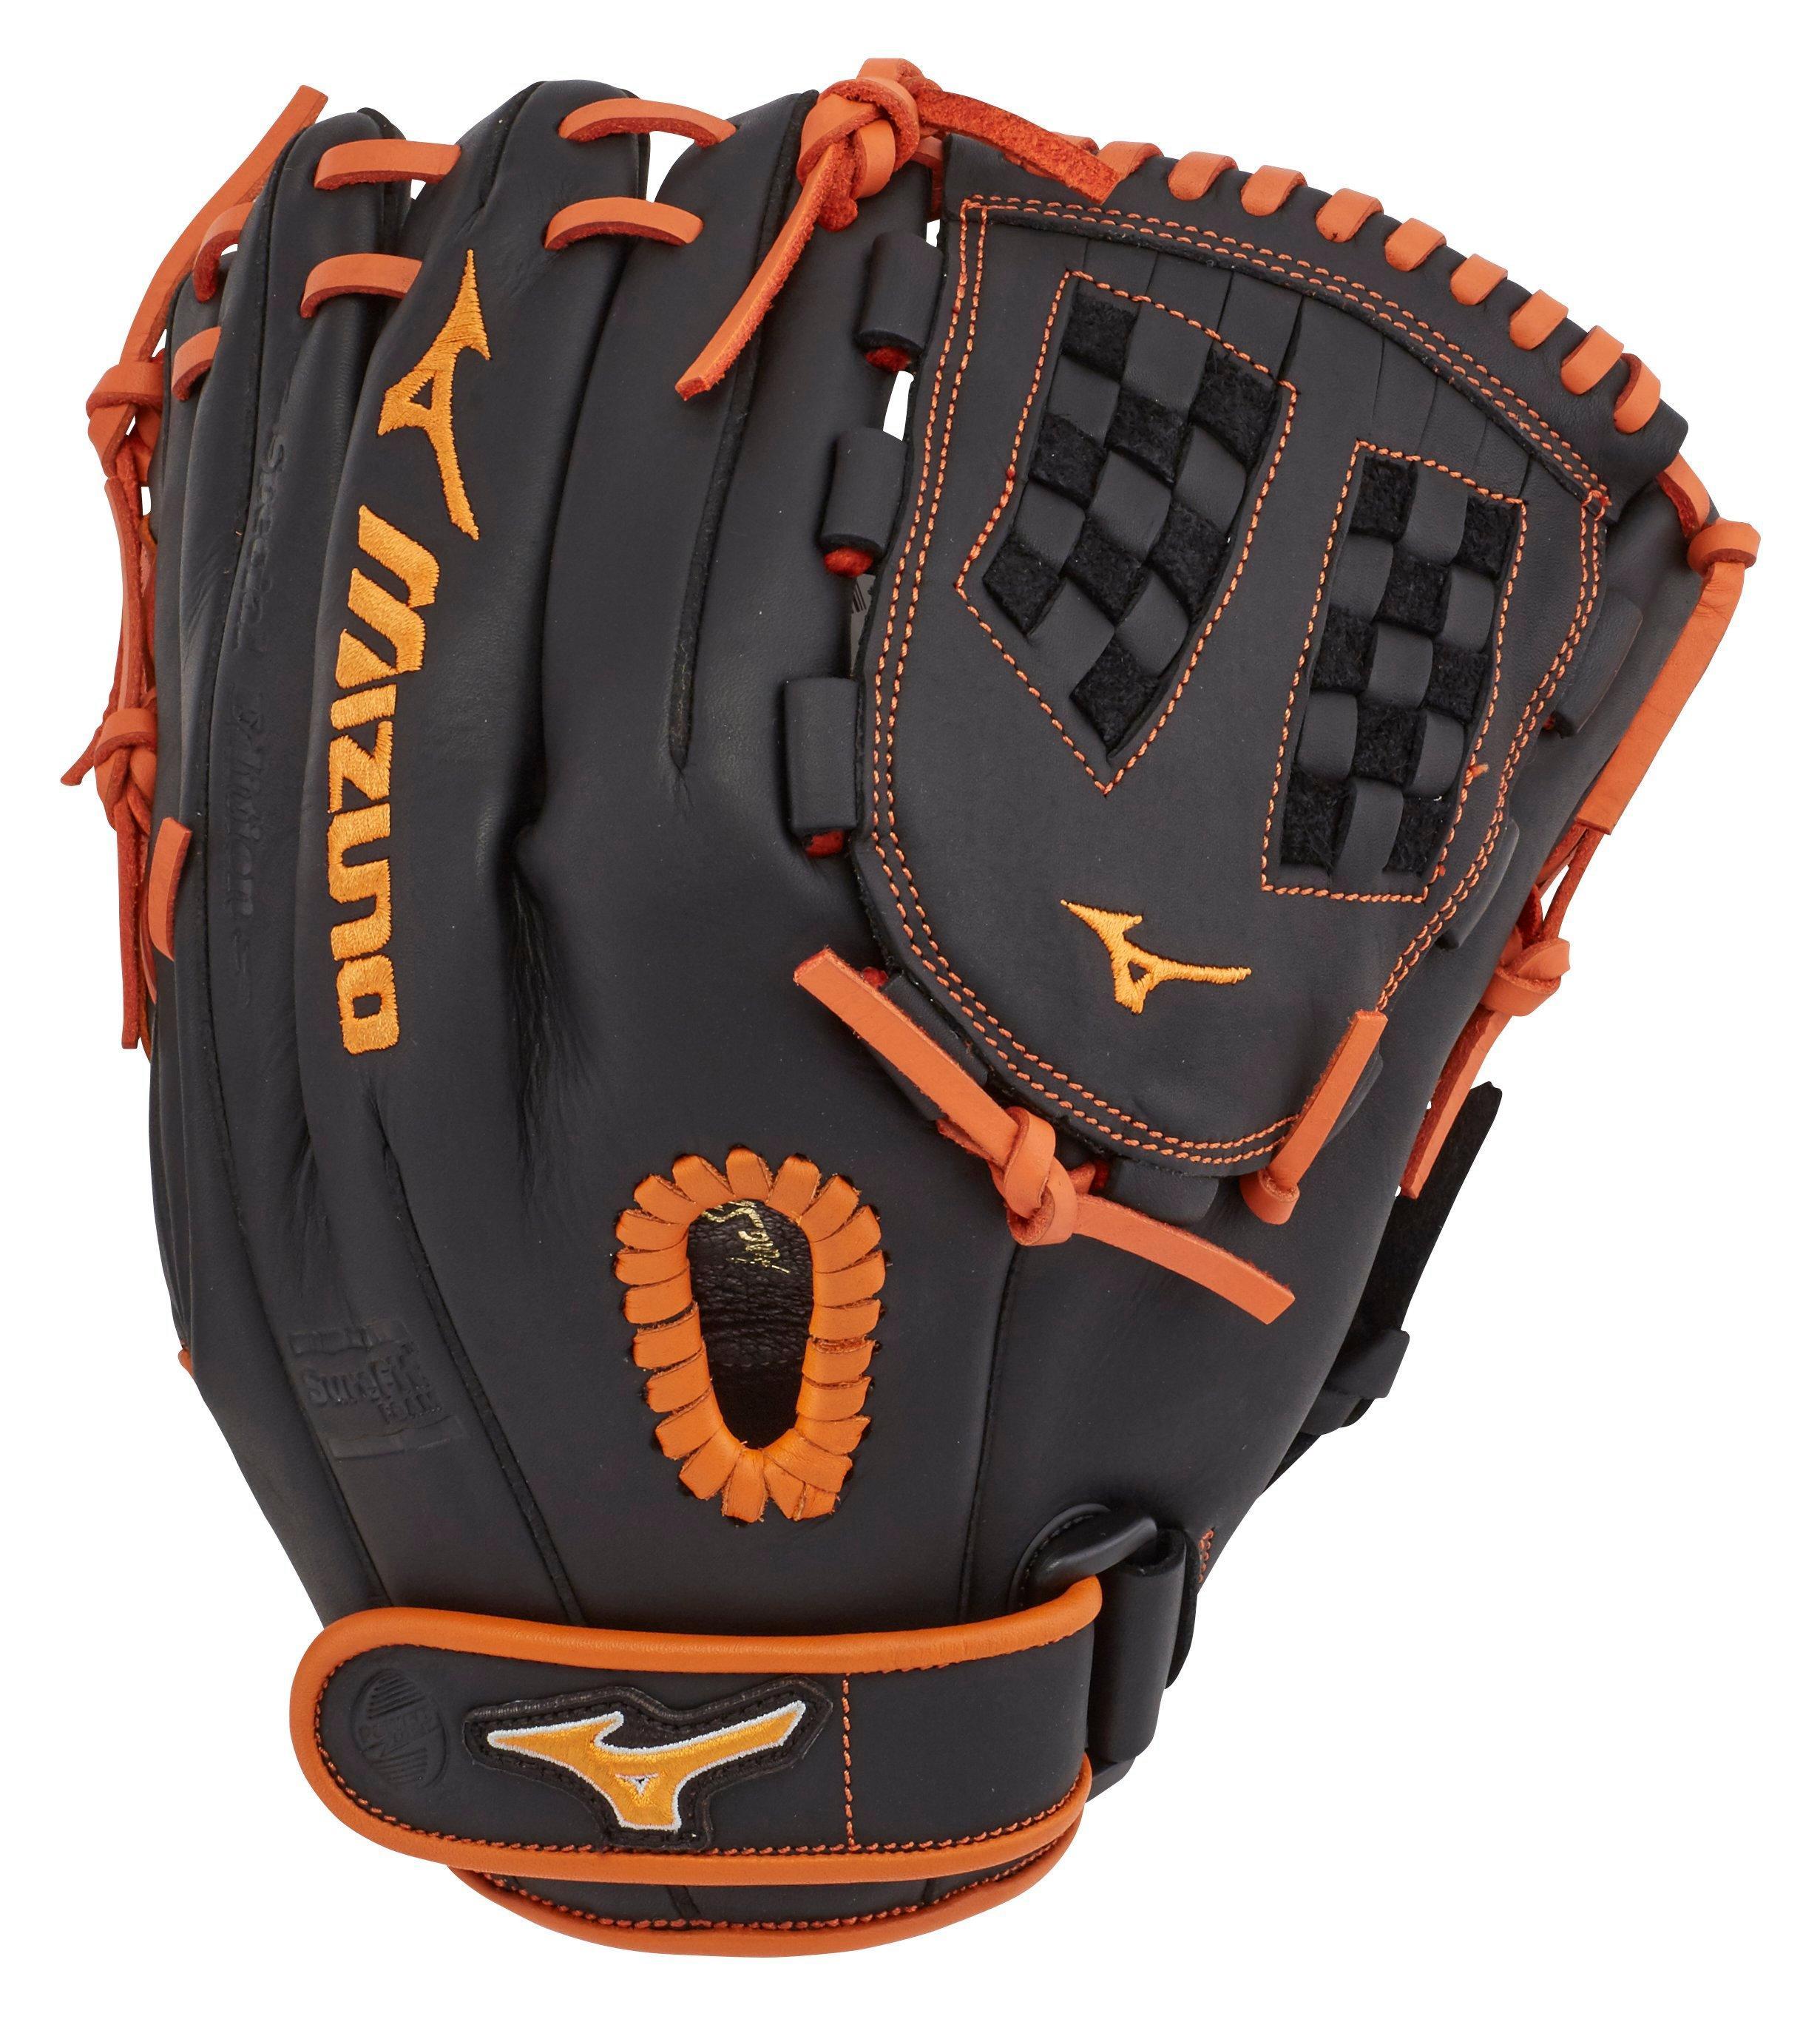 eb916a355d36 Mizuno: Mizuno Mvp Prime Se Fastpitch Softball Glove 12